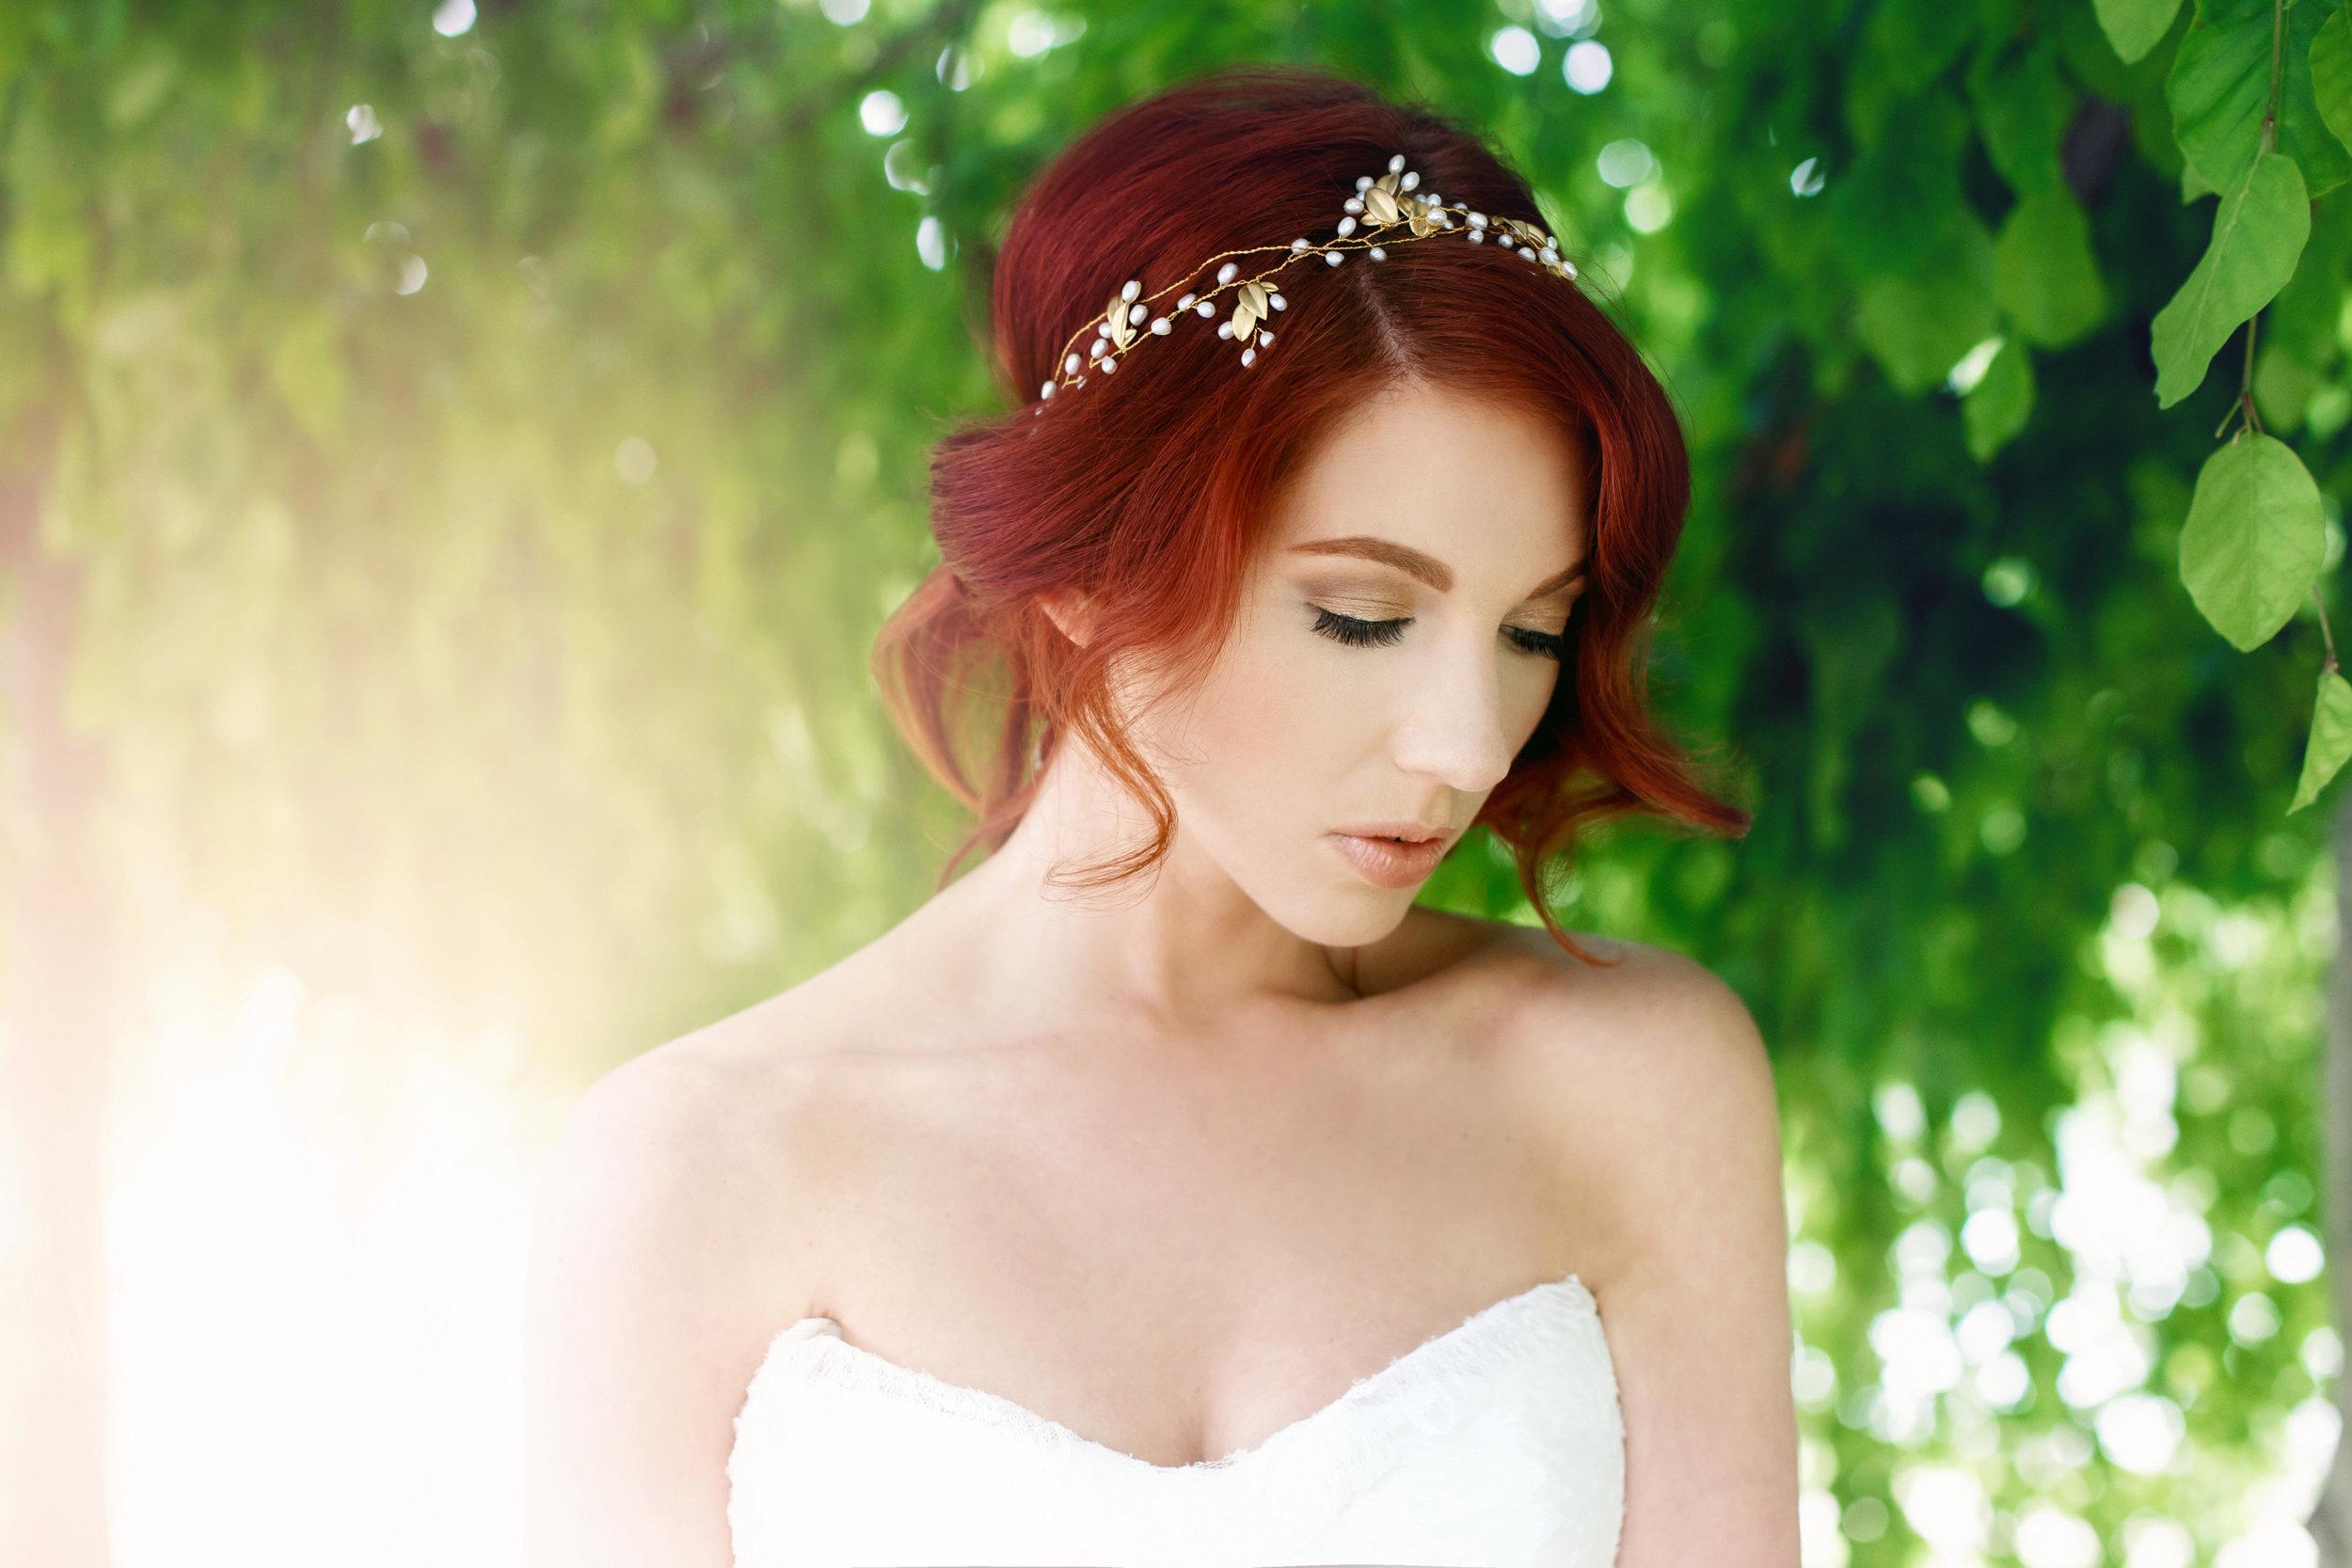 Fancy-Bowtique-hair-accessory-13.jpg